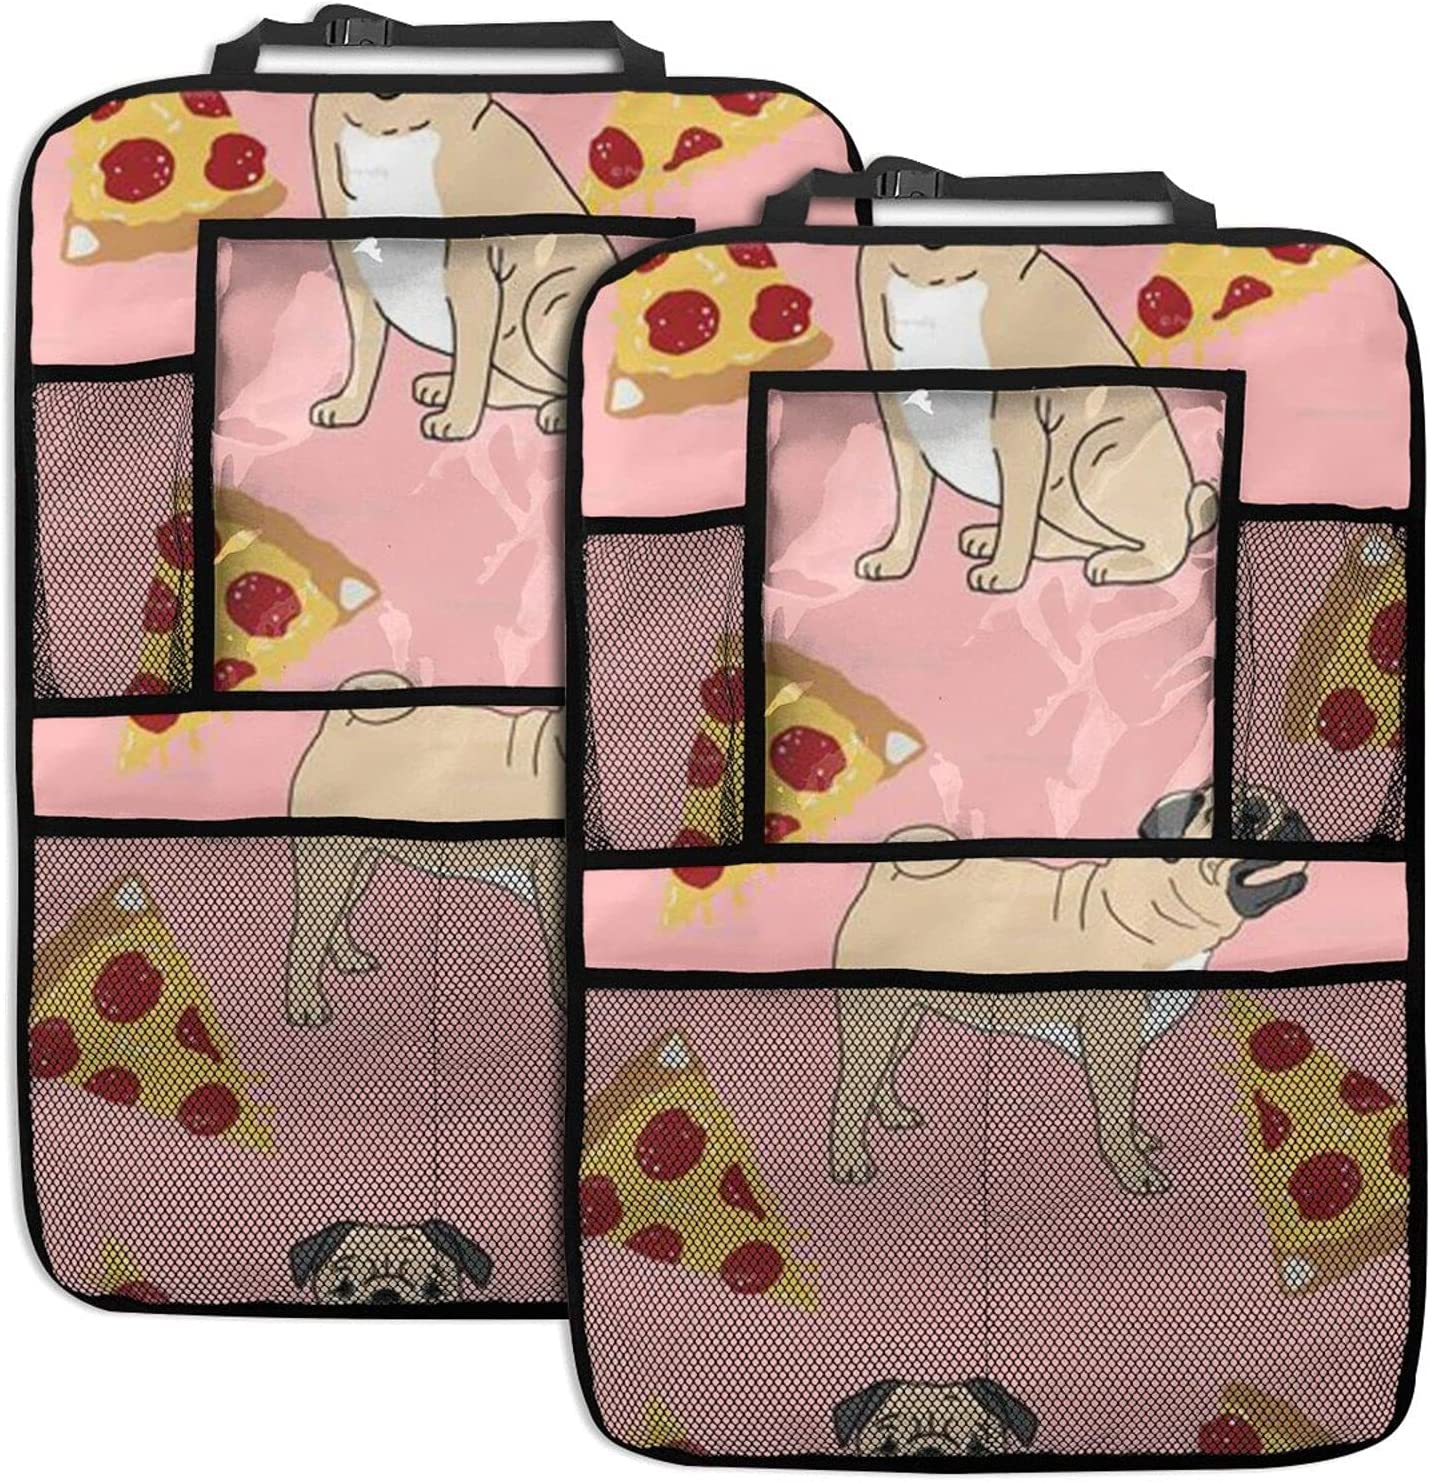 Car Backseat 70% OFF Outlet Organizer Pug Pizza Organi Print Back Pink Seat Lowest price challenge